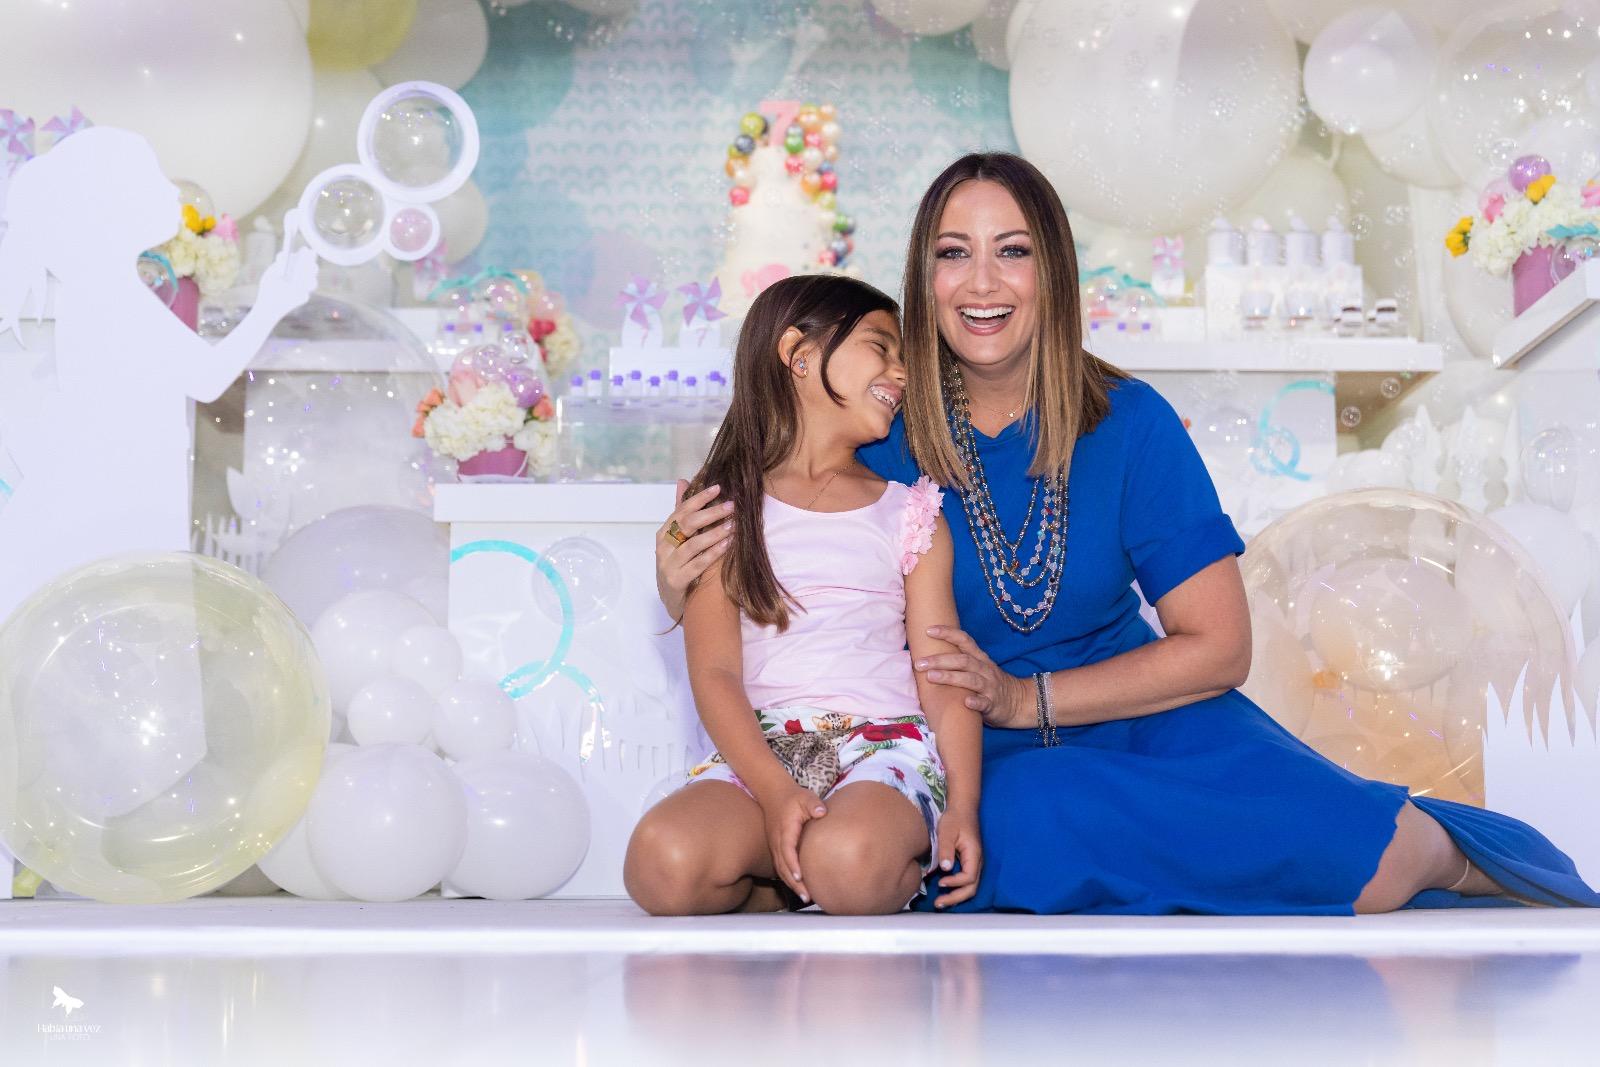 Cumpleaños Amanda, hija Karla Monroig y Tommy Torres